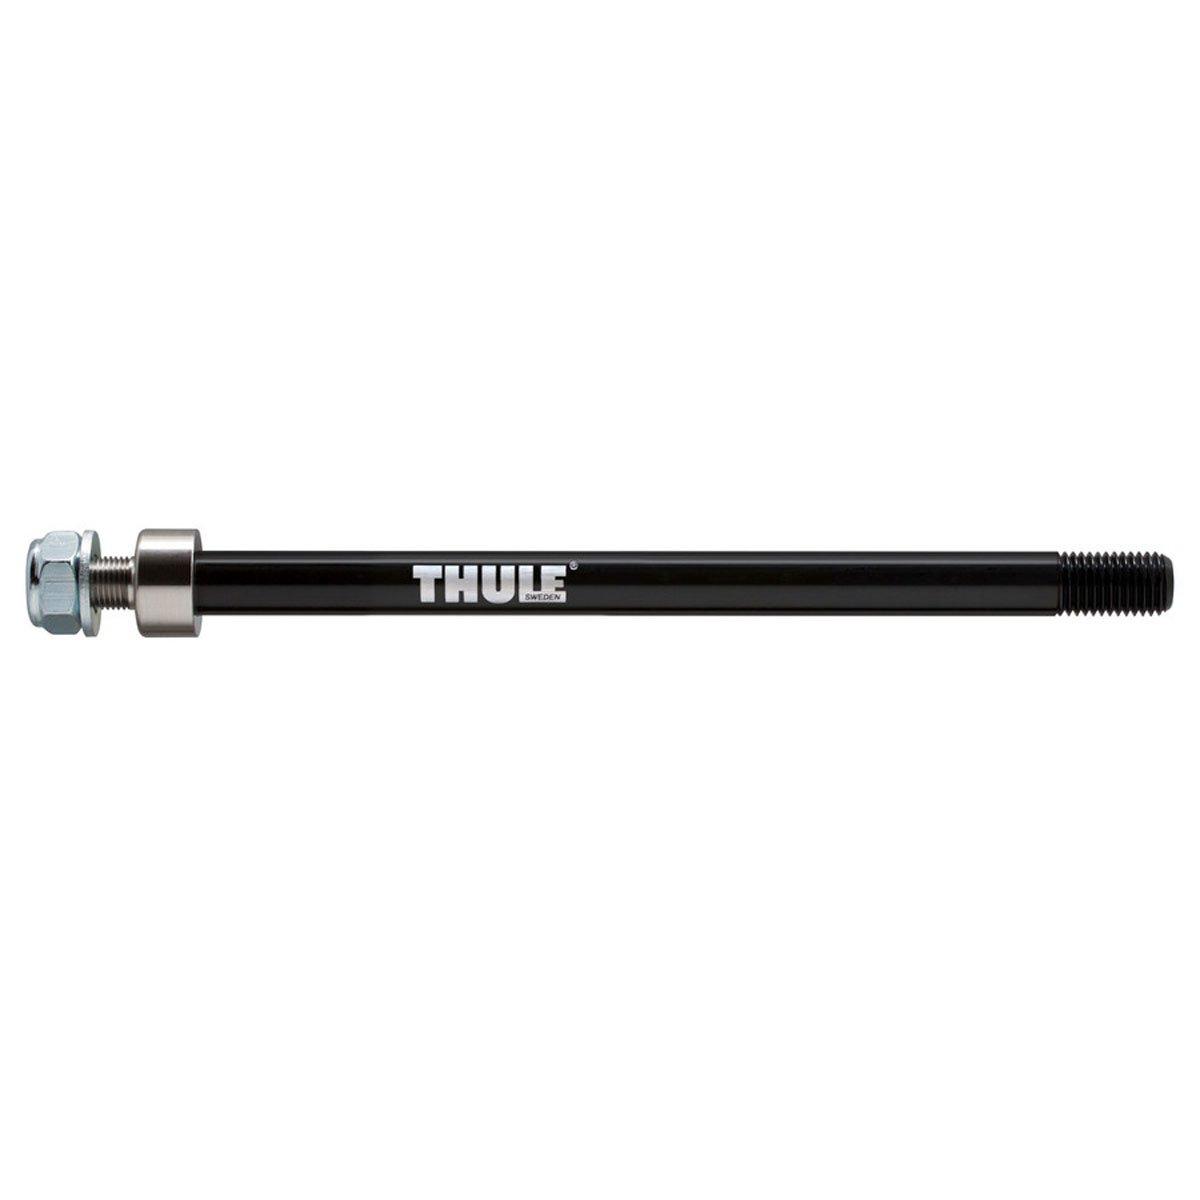 Thule Thru Axle 162-174mm (M12X1.0) Bike Child Seats